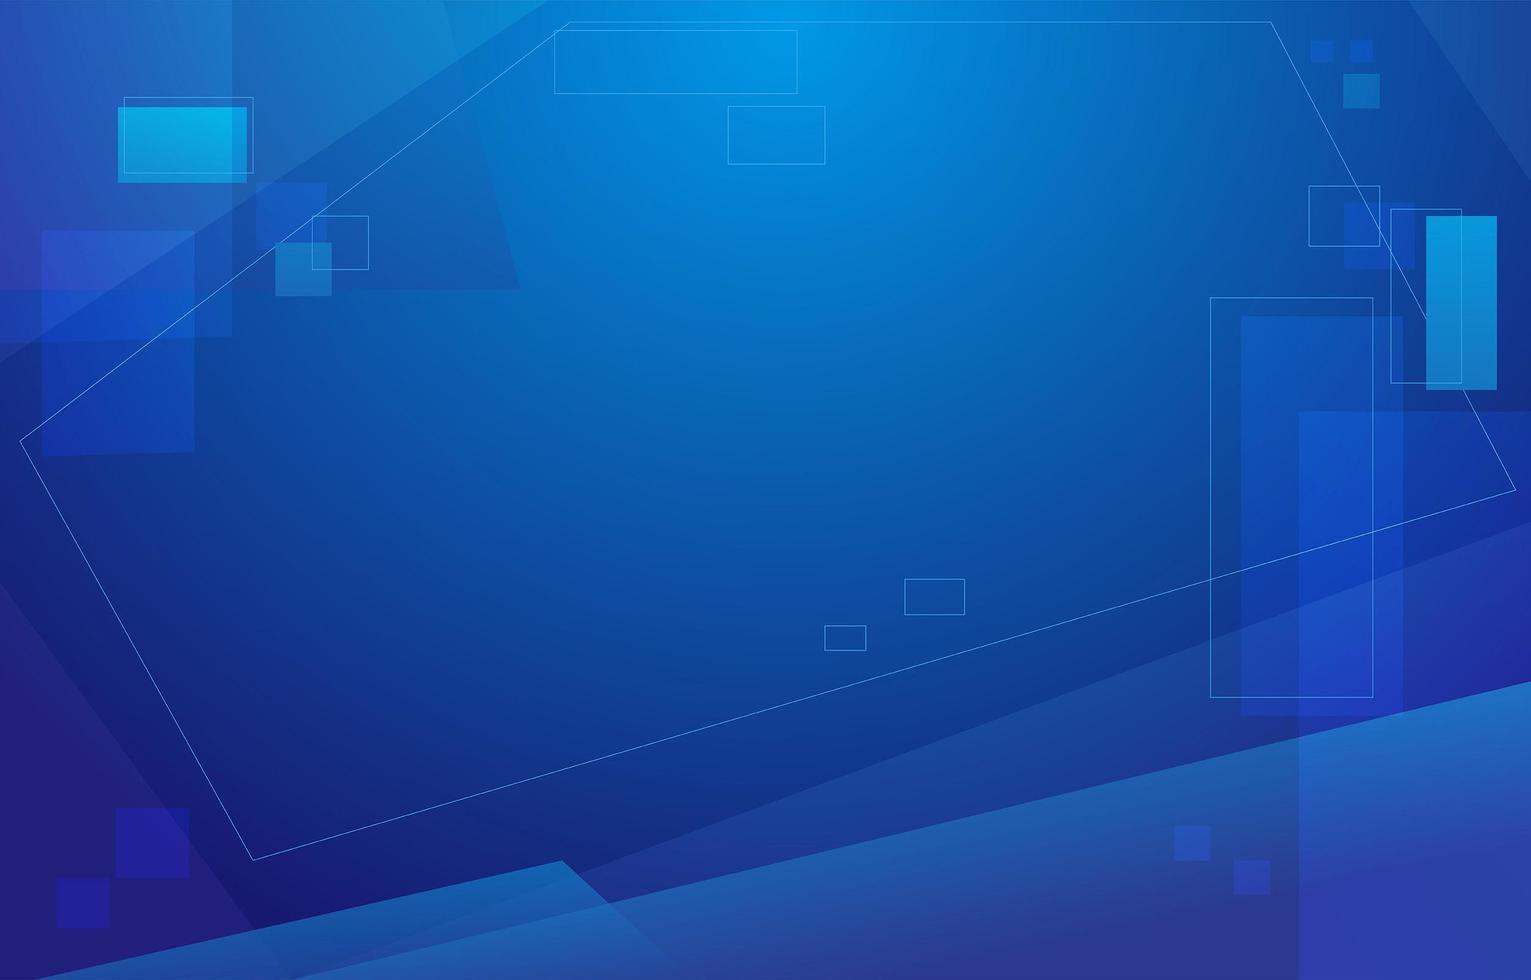 Geometric Square Blue Background vector